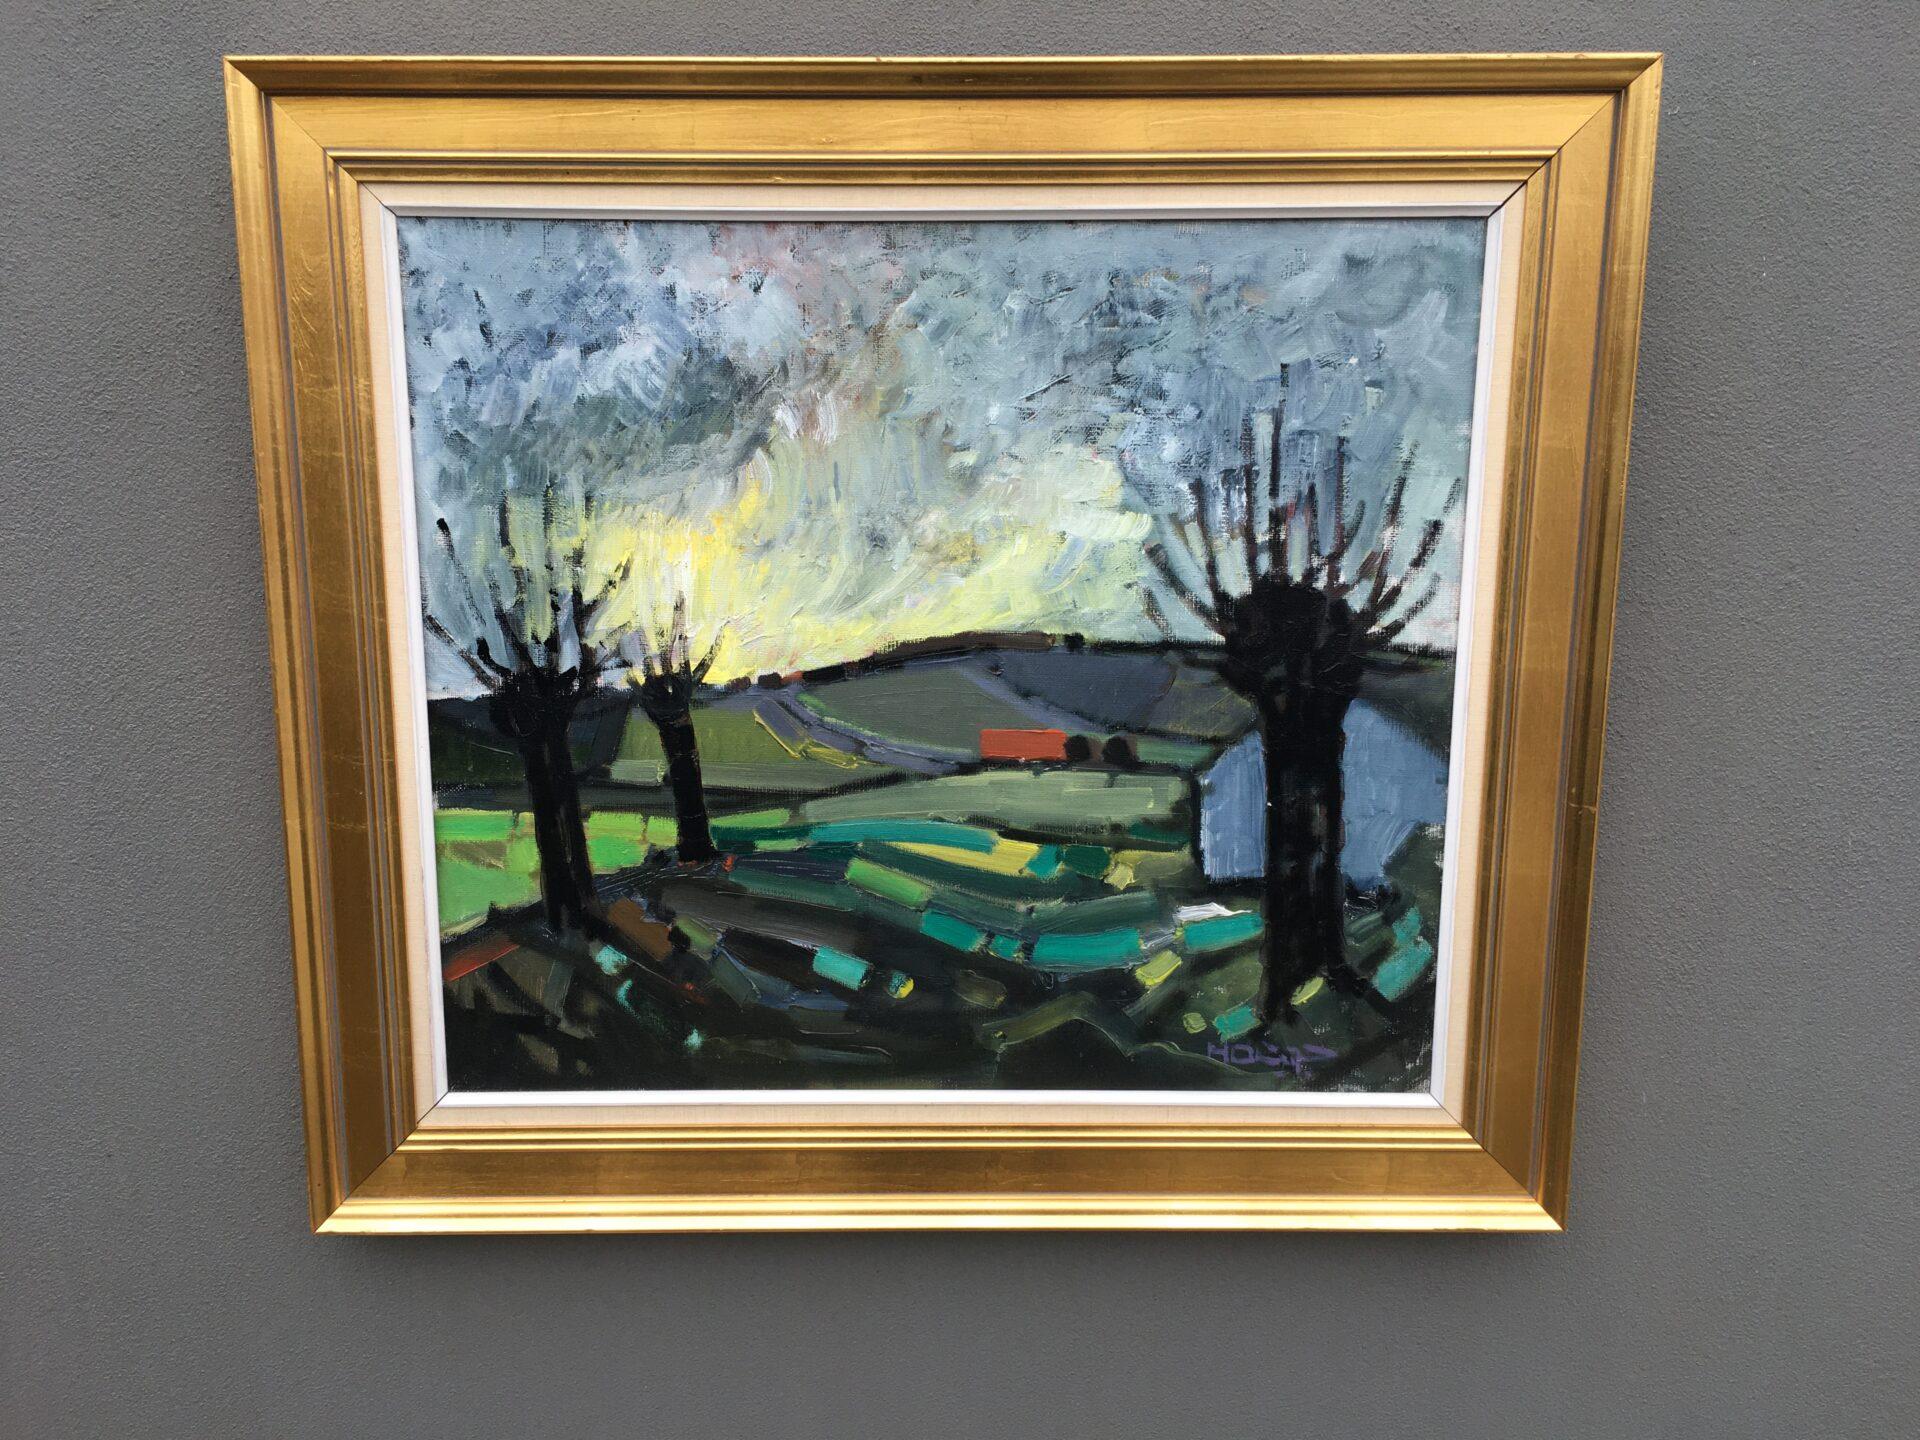 Knud Horup, maleri, rammemål 88x77 cm, pris 1000kr